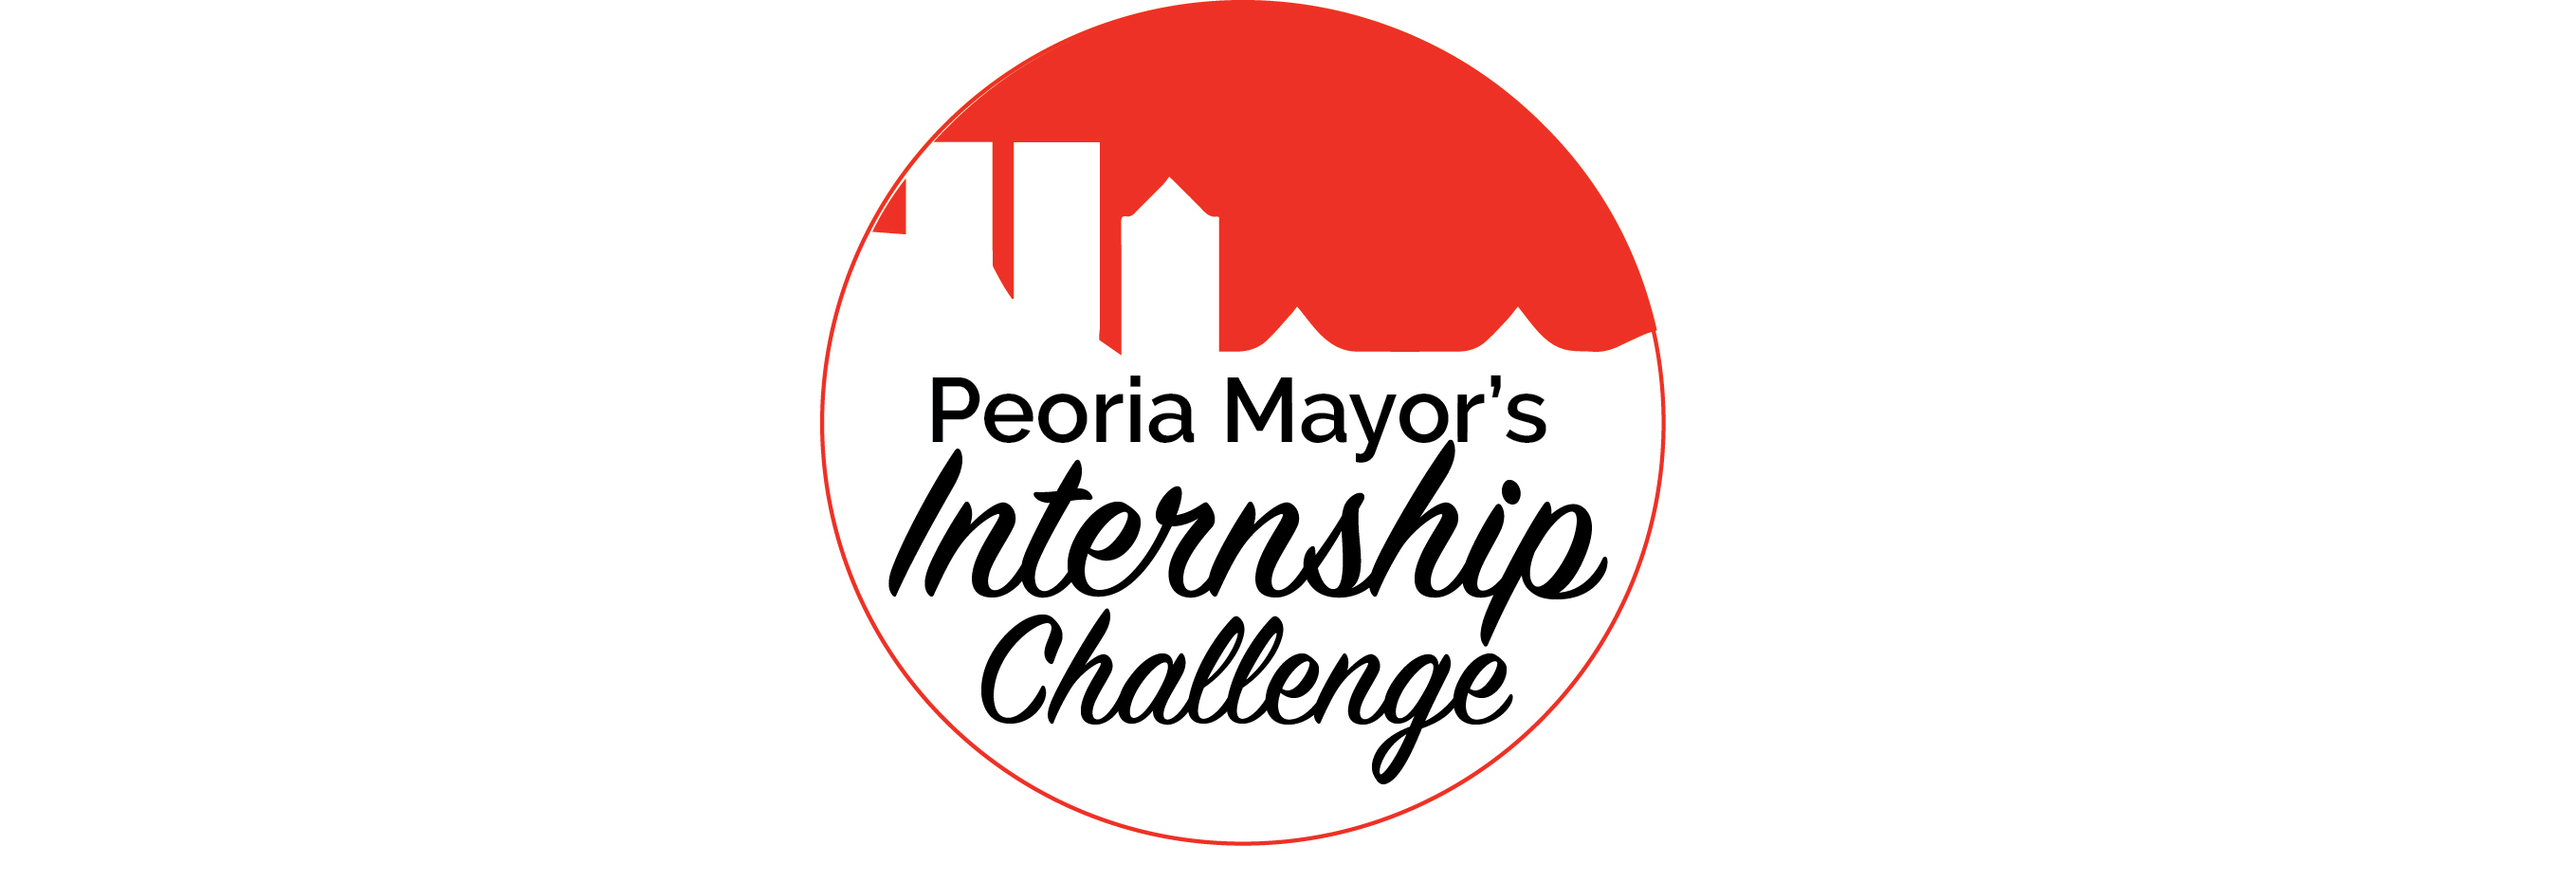 CSE Software™ Inc. Participating in Mayor's Internship Challenge